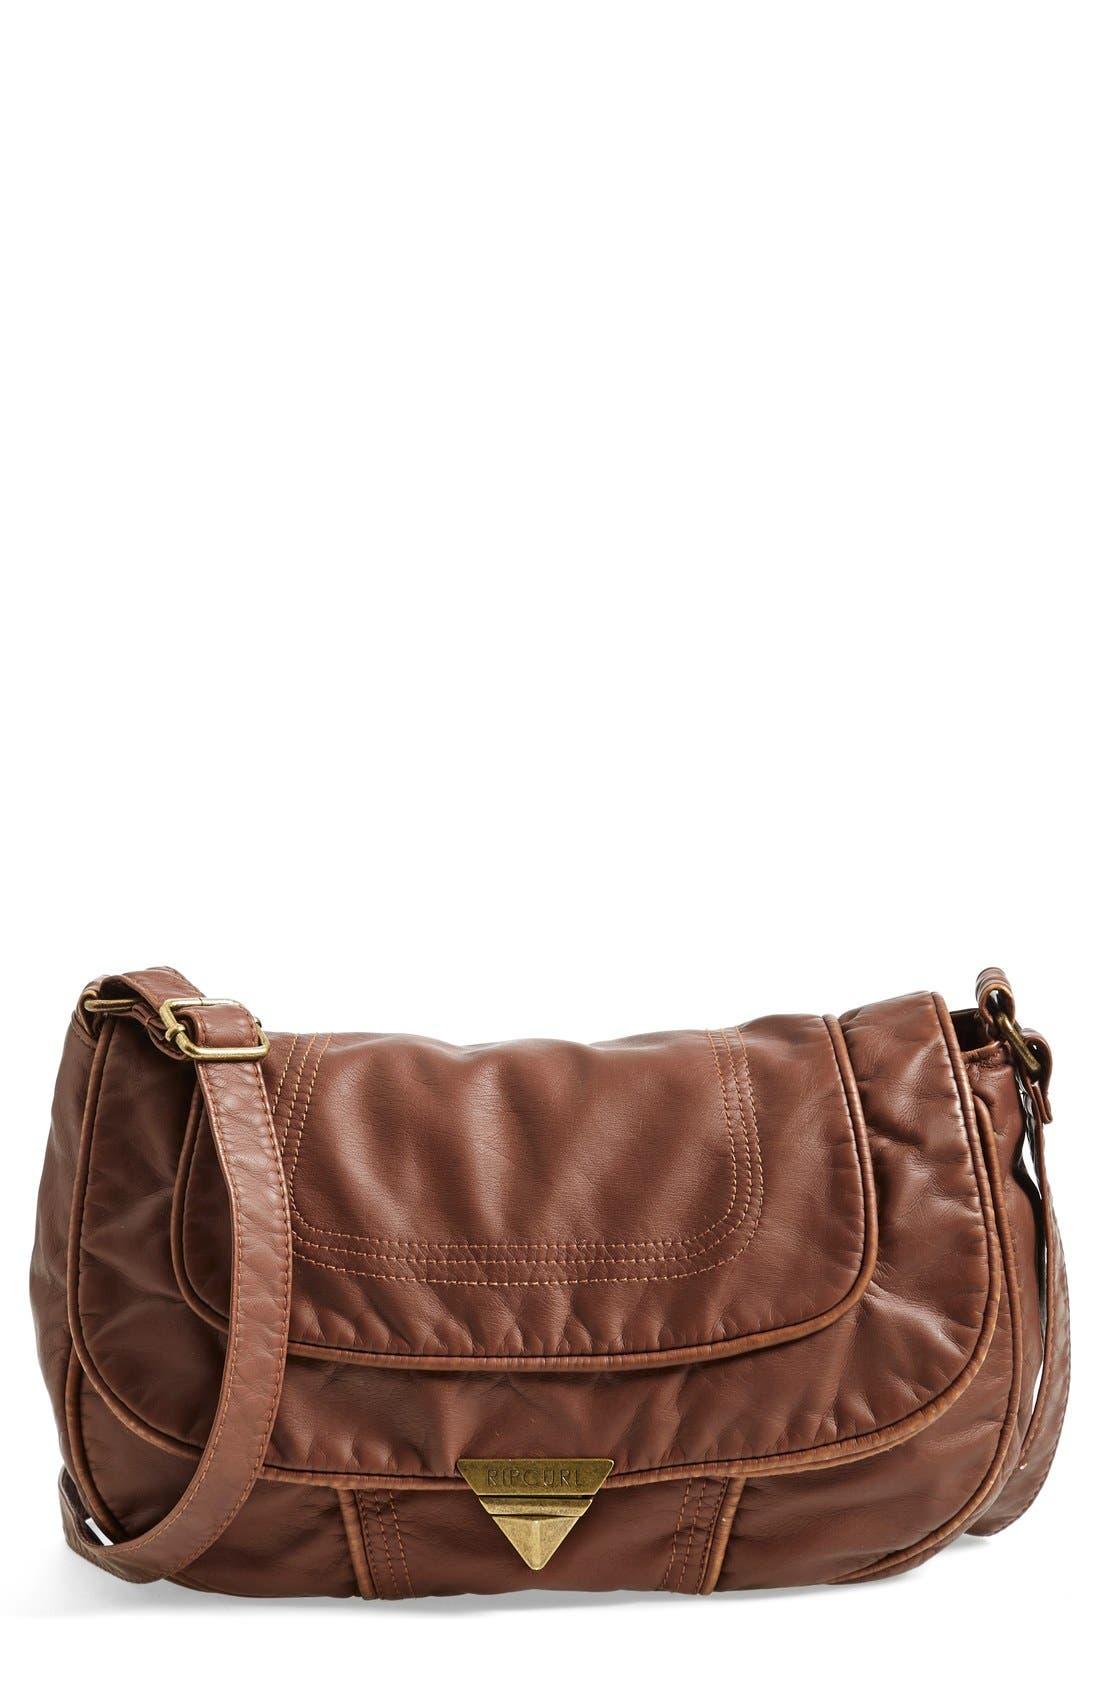 Alternate Image 1 Selected - Rip Curl 'True Story' Shoulder Bag